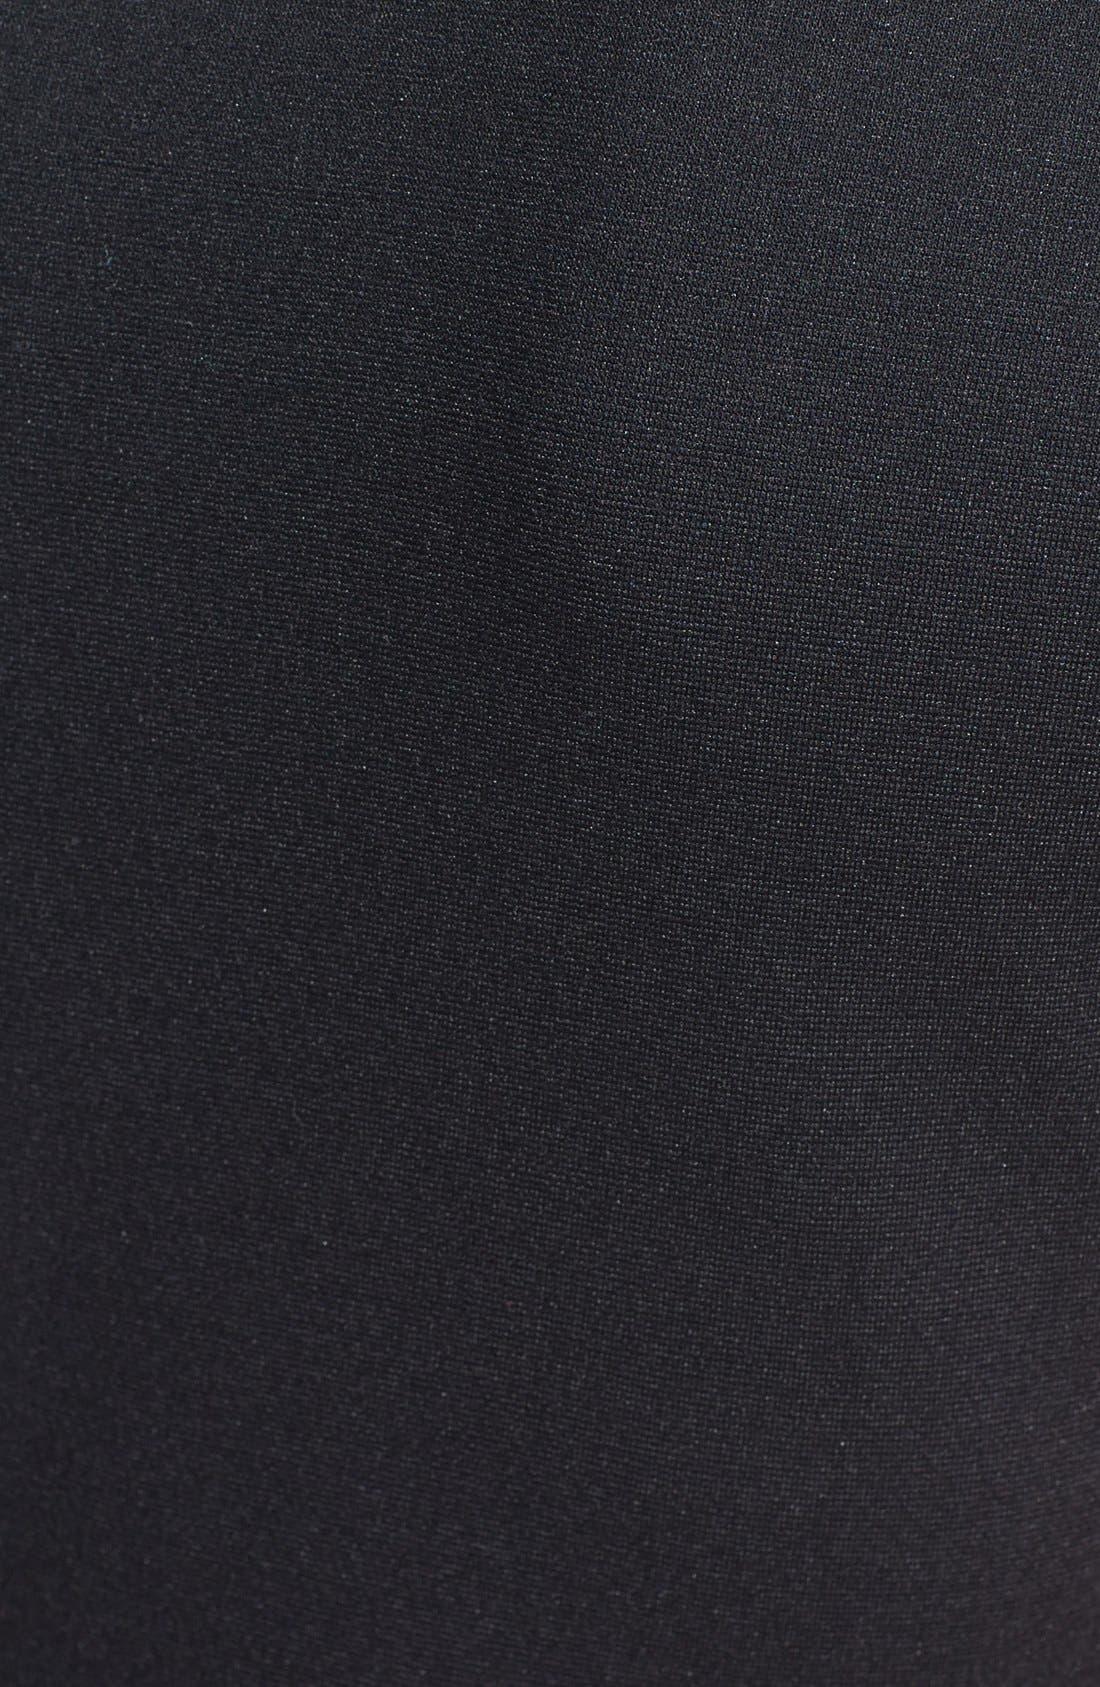 Alternate Image 4  - B44 Dressed by Bailey 44 'Fashion Doll' Faux Leather Sleeves Sheath Dress